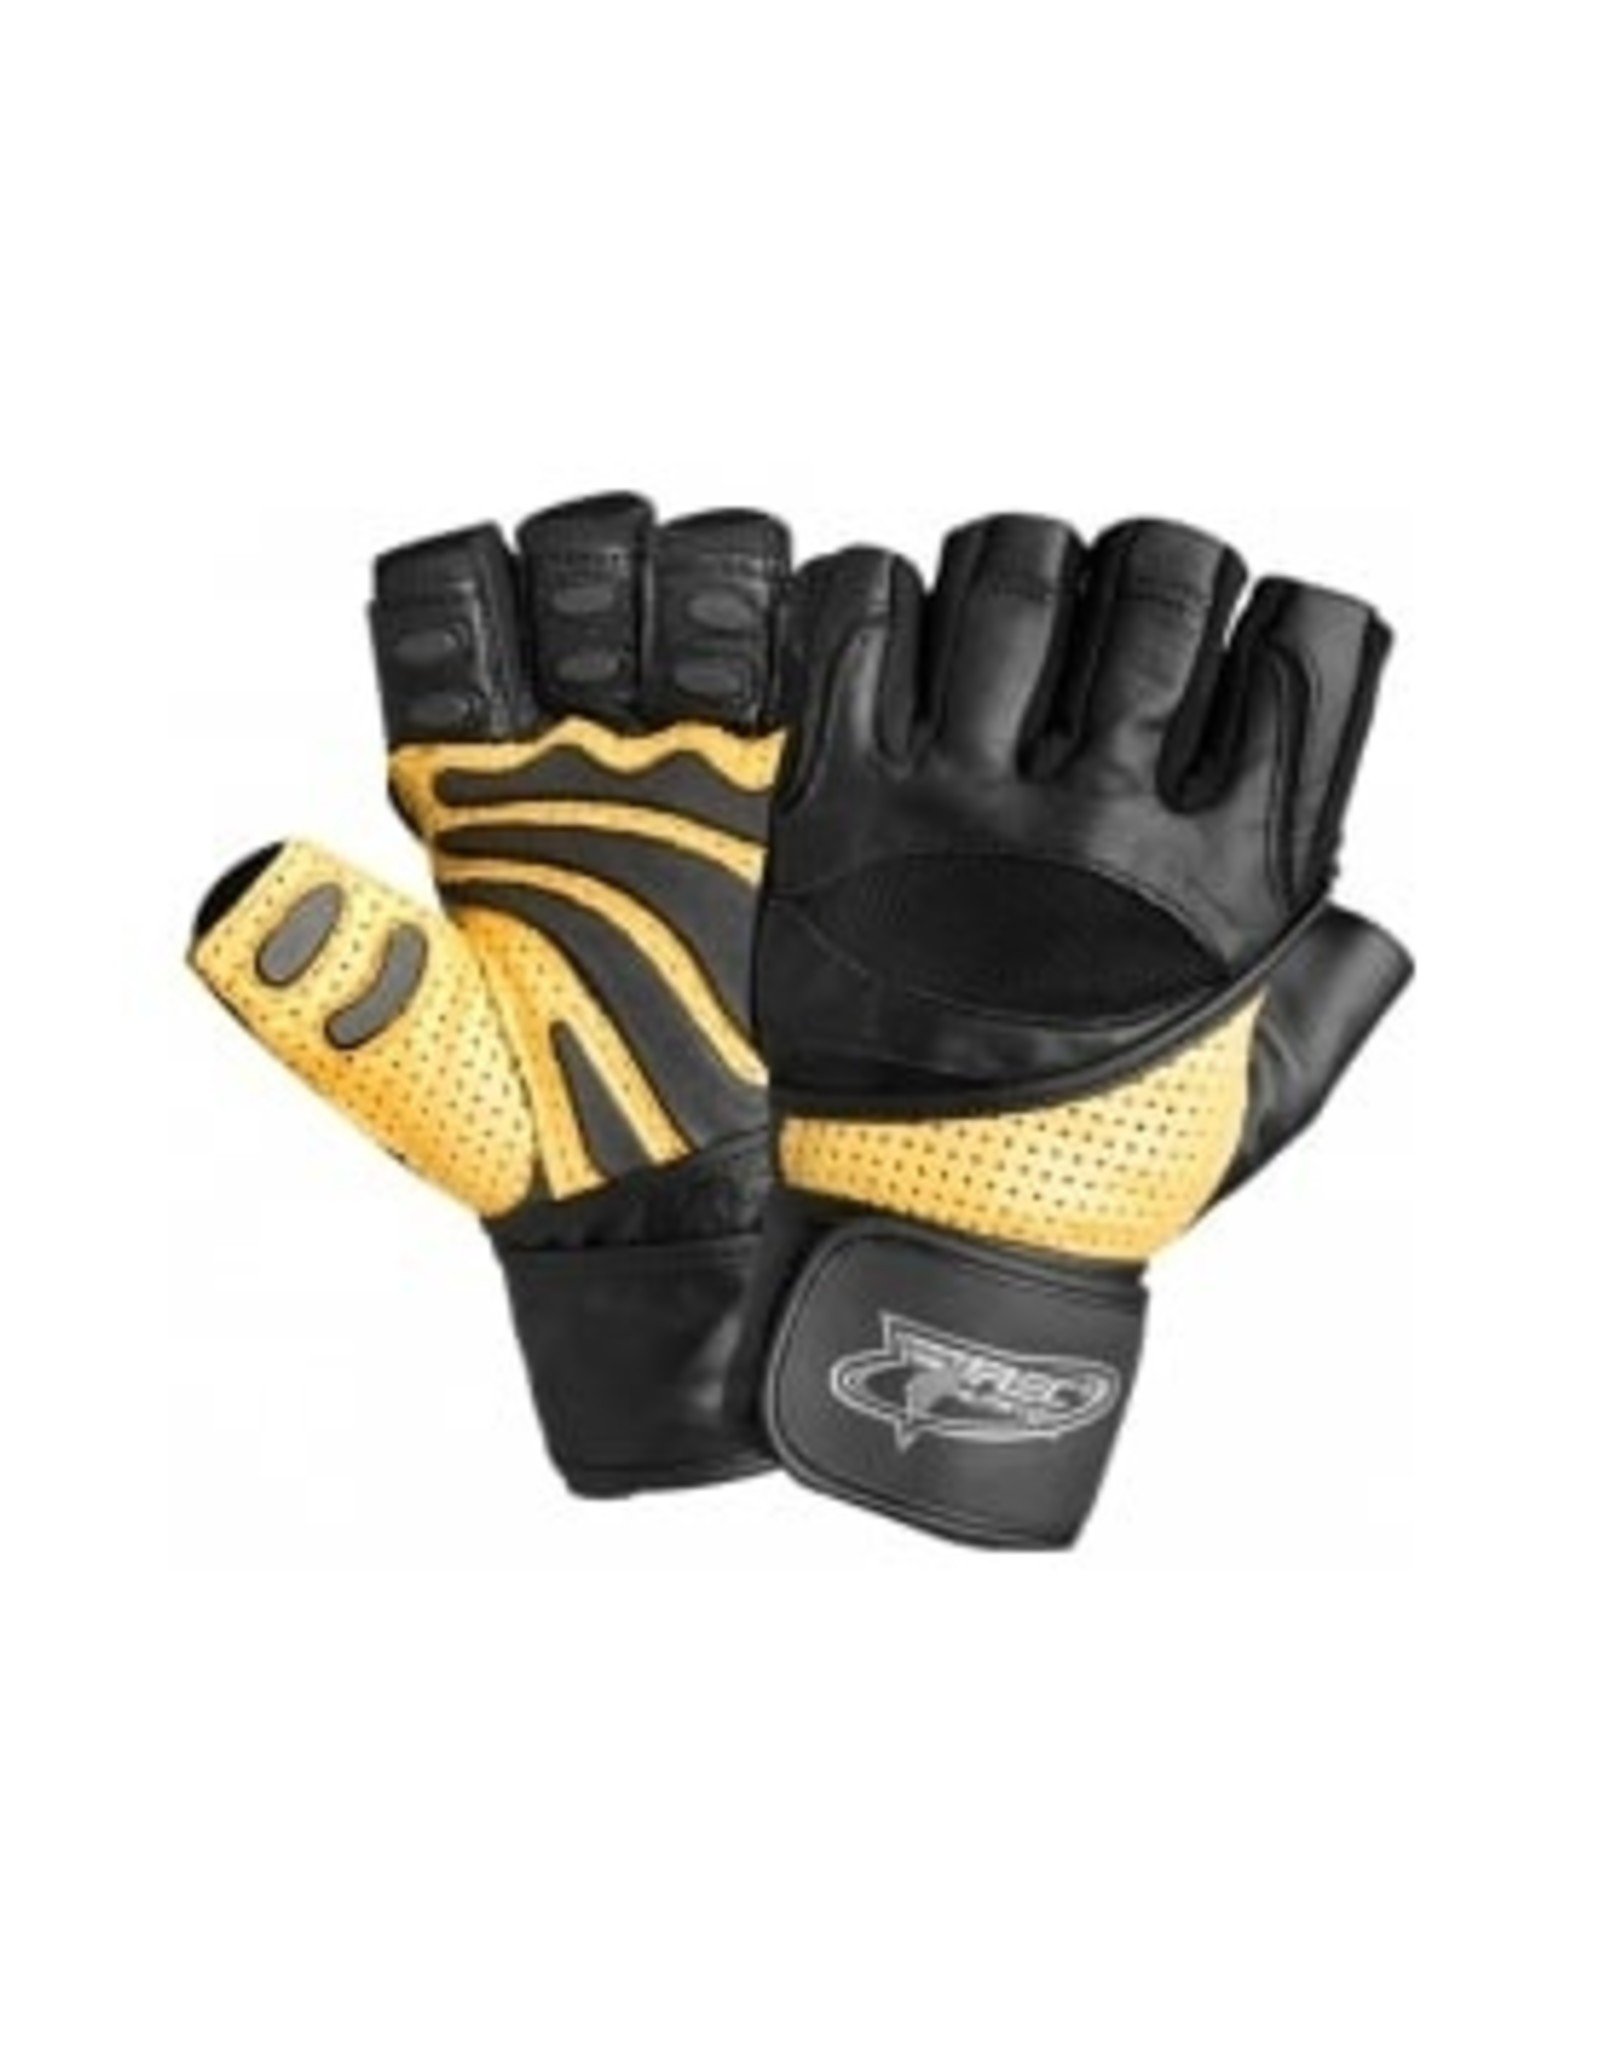 TREC NUTRITION Wrist wrap gloves - Power max